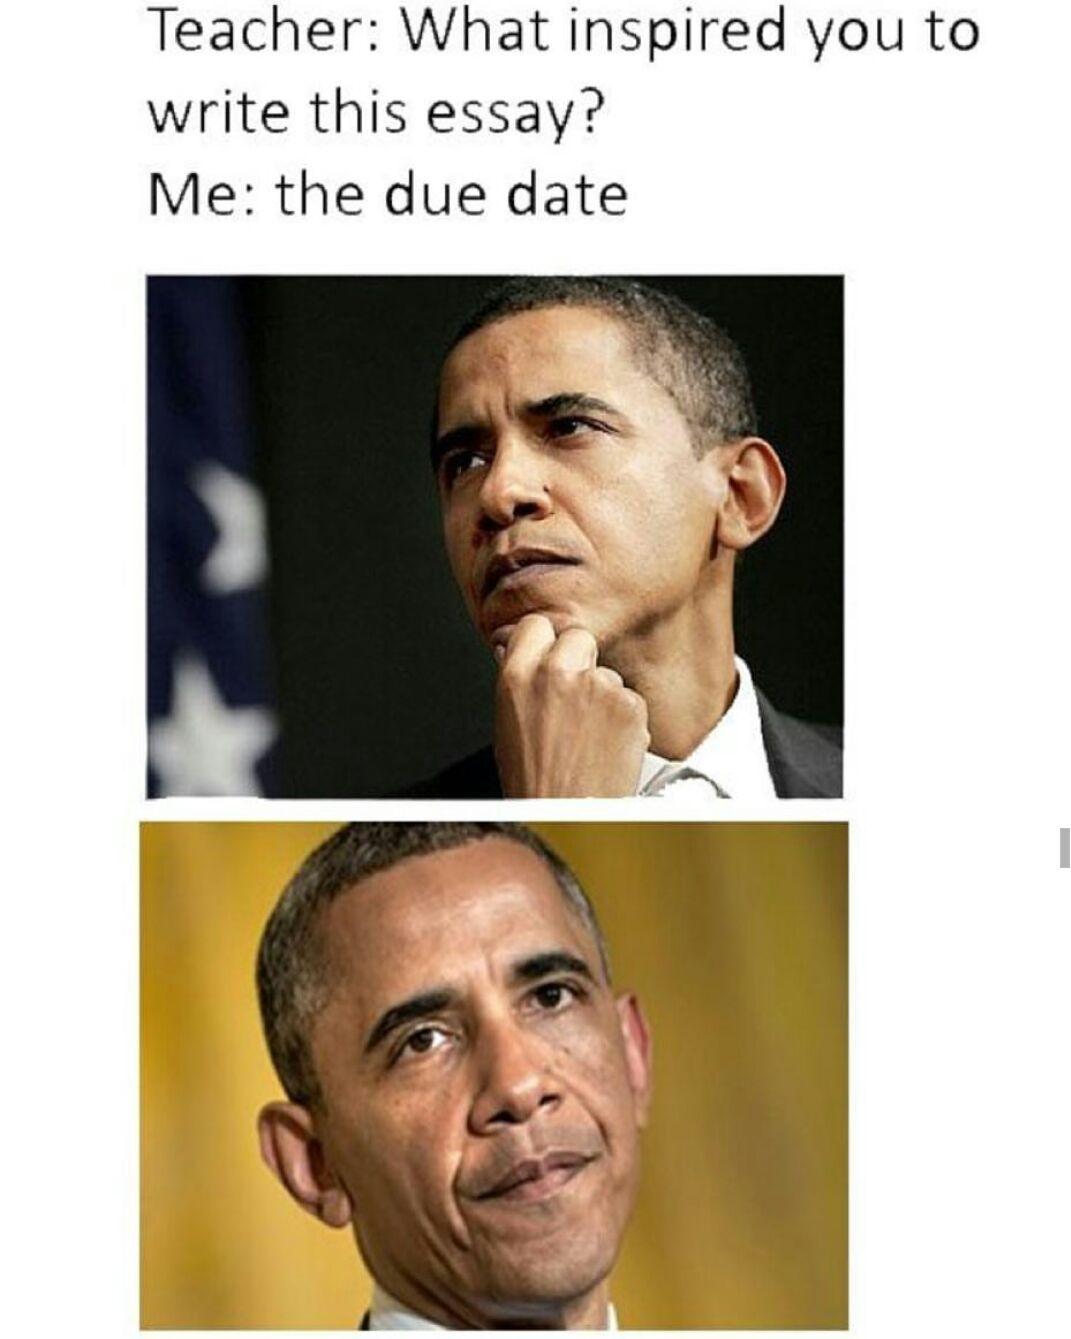 students be like... - meme